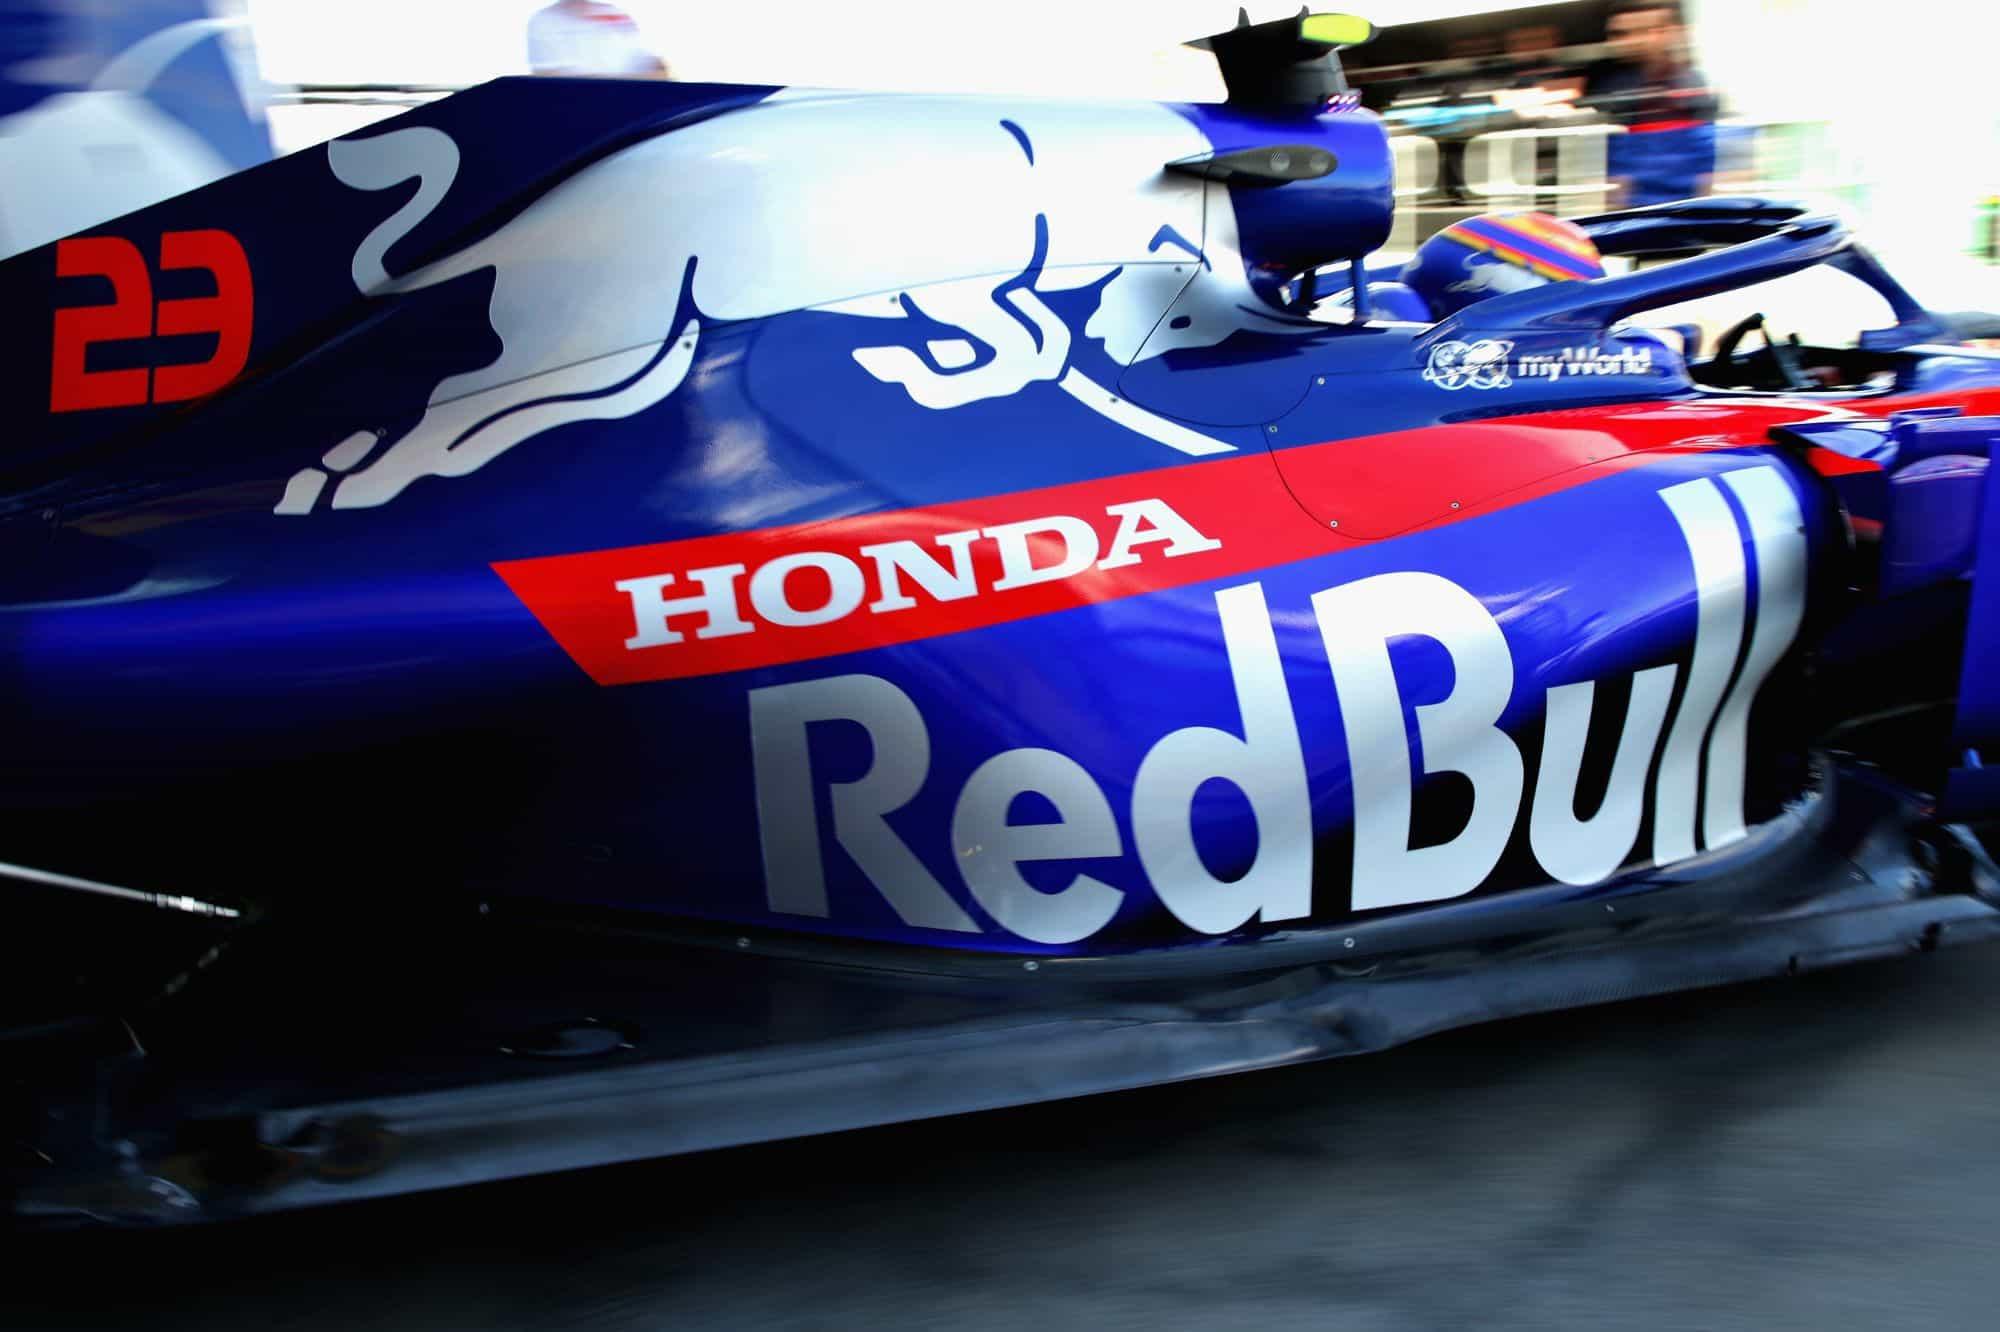 Alexander Albon Toro Rosso Honda STR14 Australian GP F1 2019 pitlane Photo Red Bull